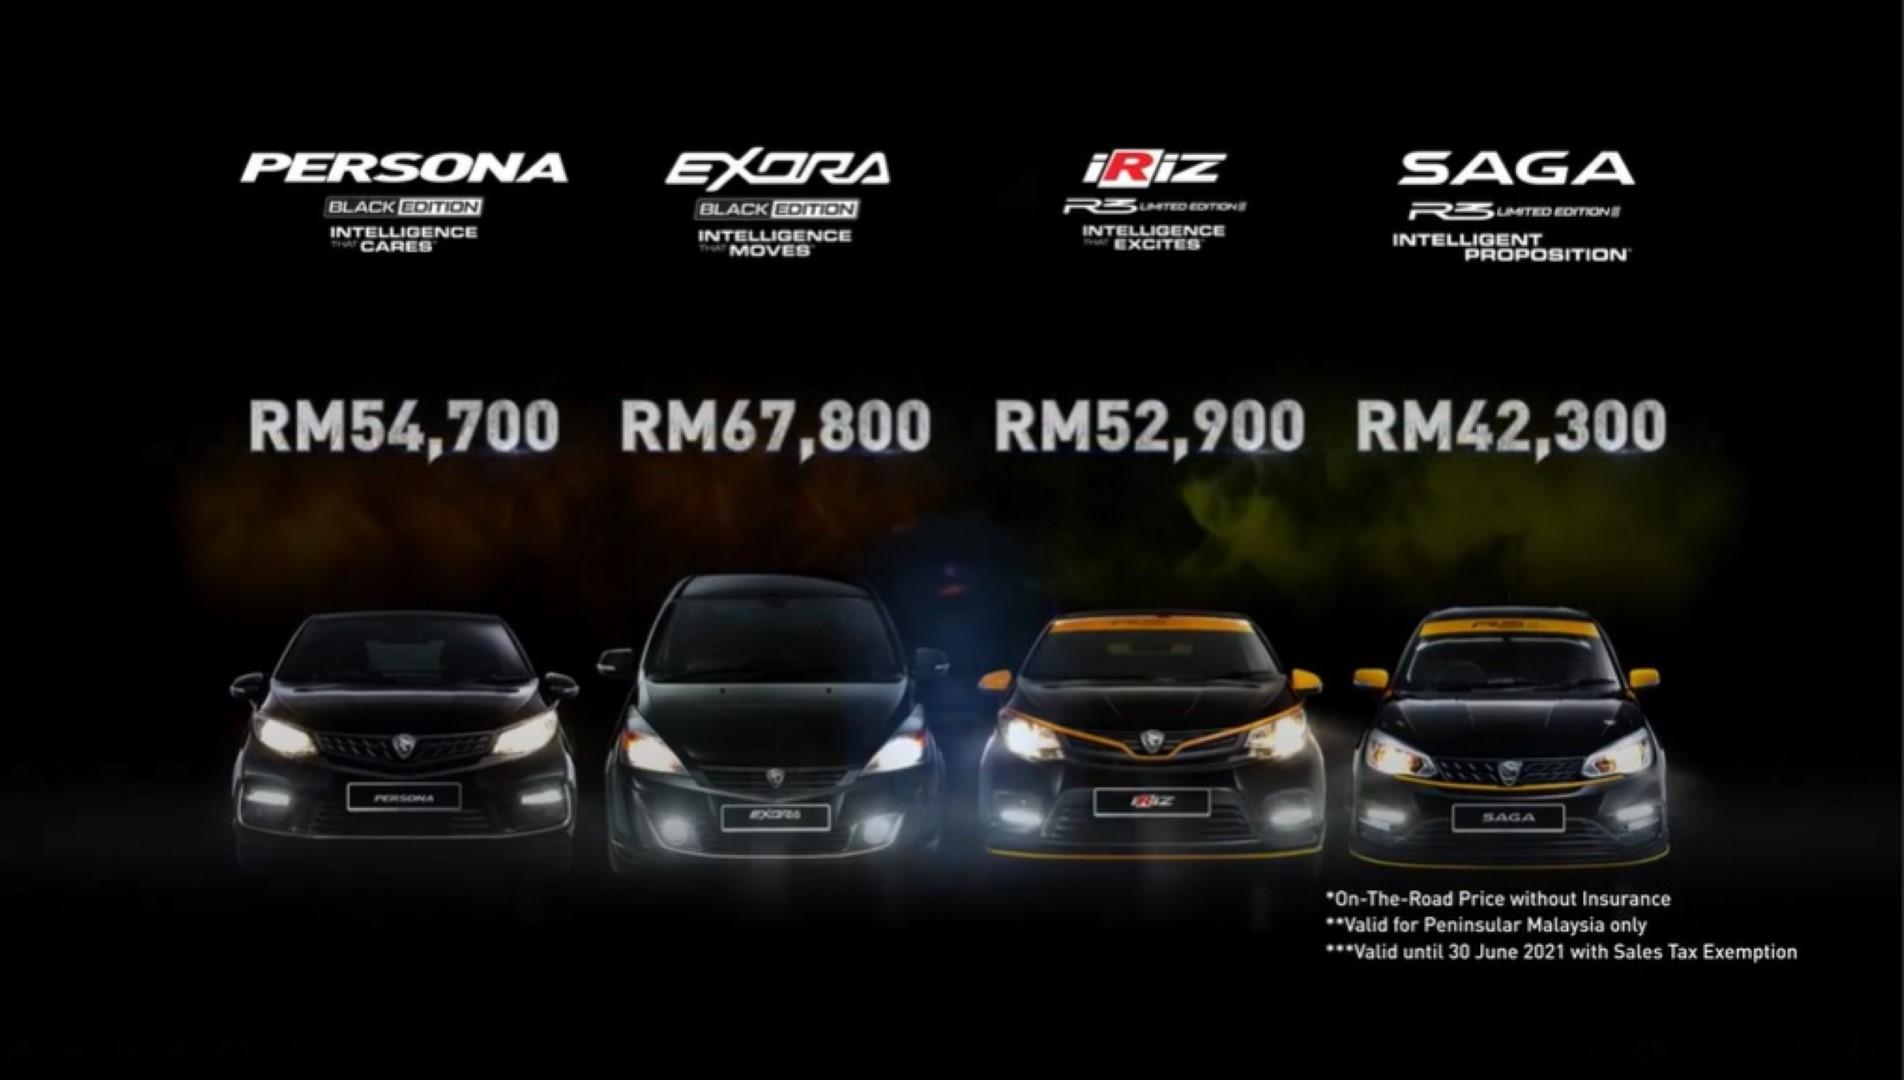 Proton special edition model price